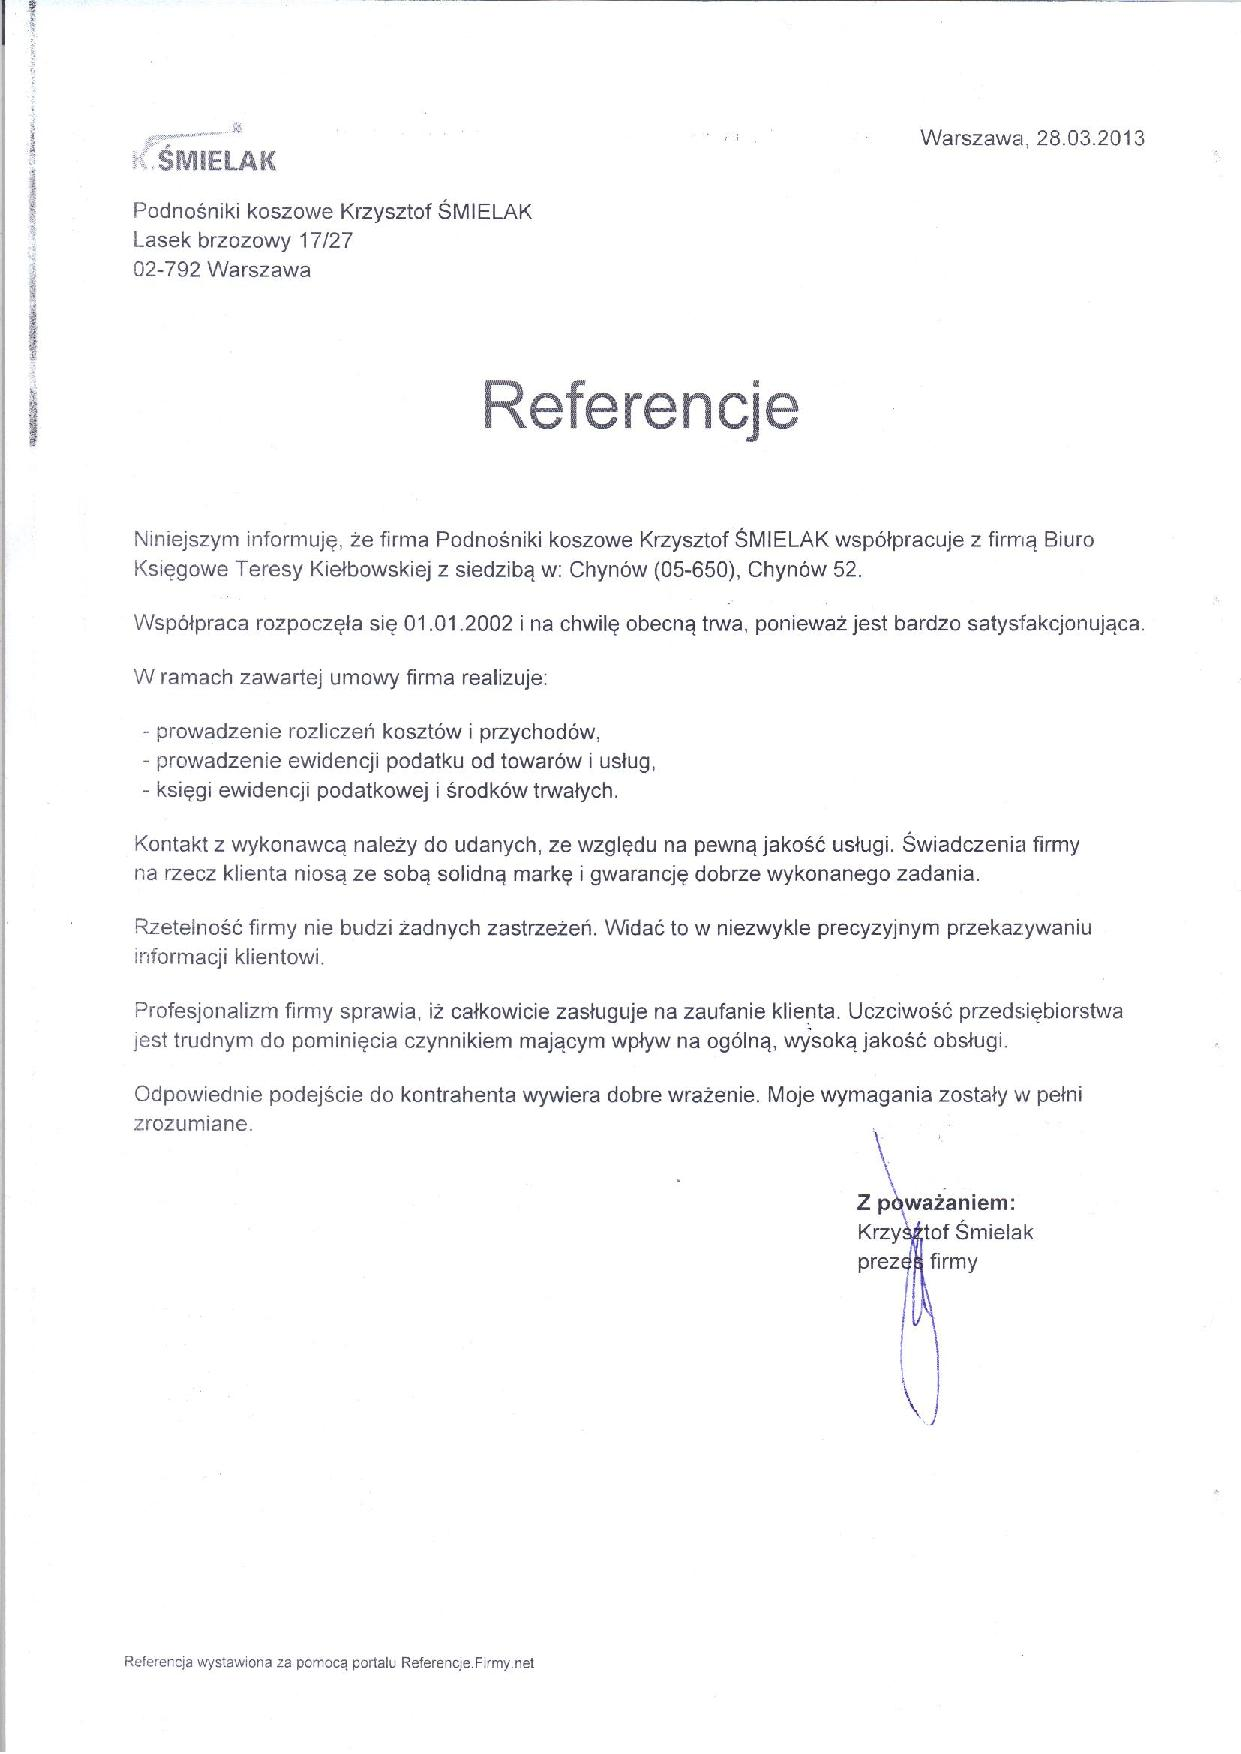 20130521_140028.pdf referencje smielak-page-001